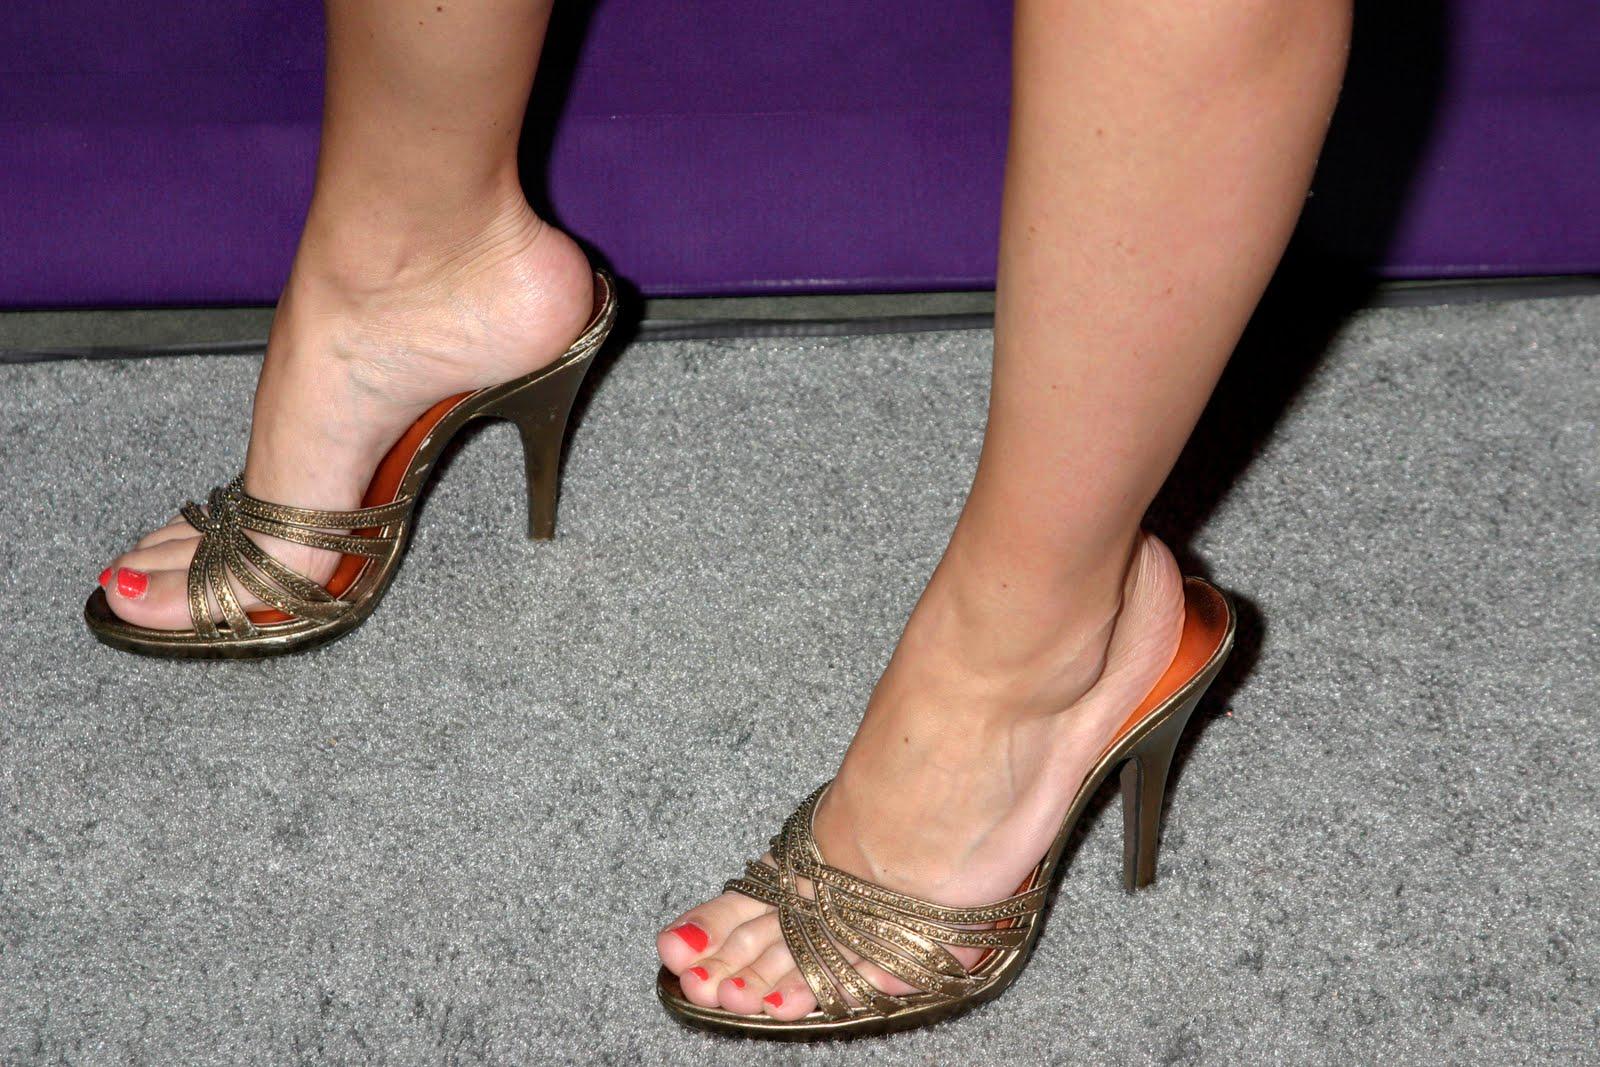 Tits Feet Jewel Staite naked photo 2017